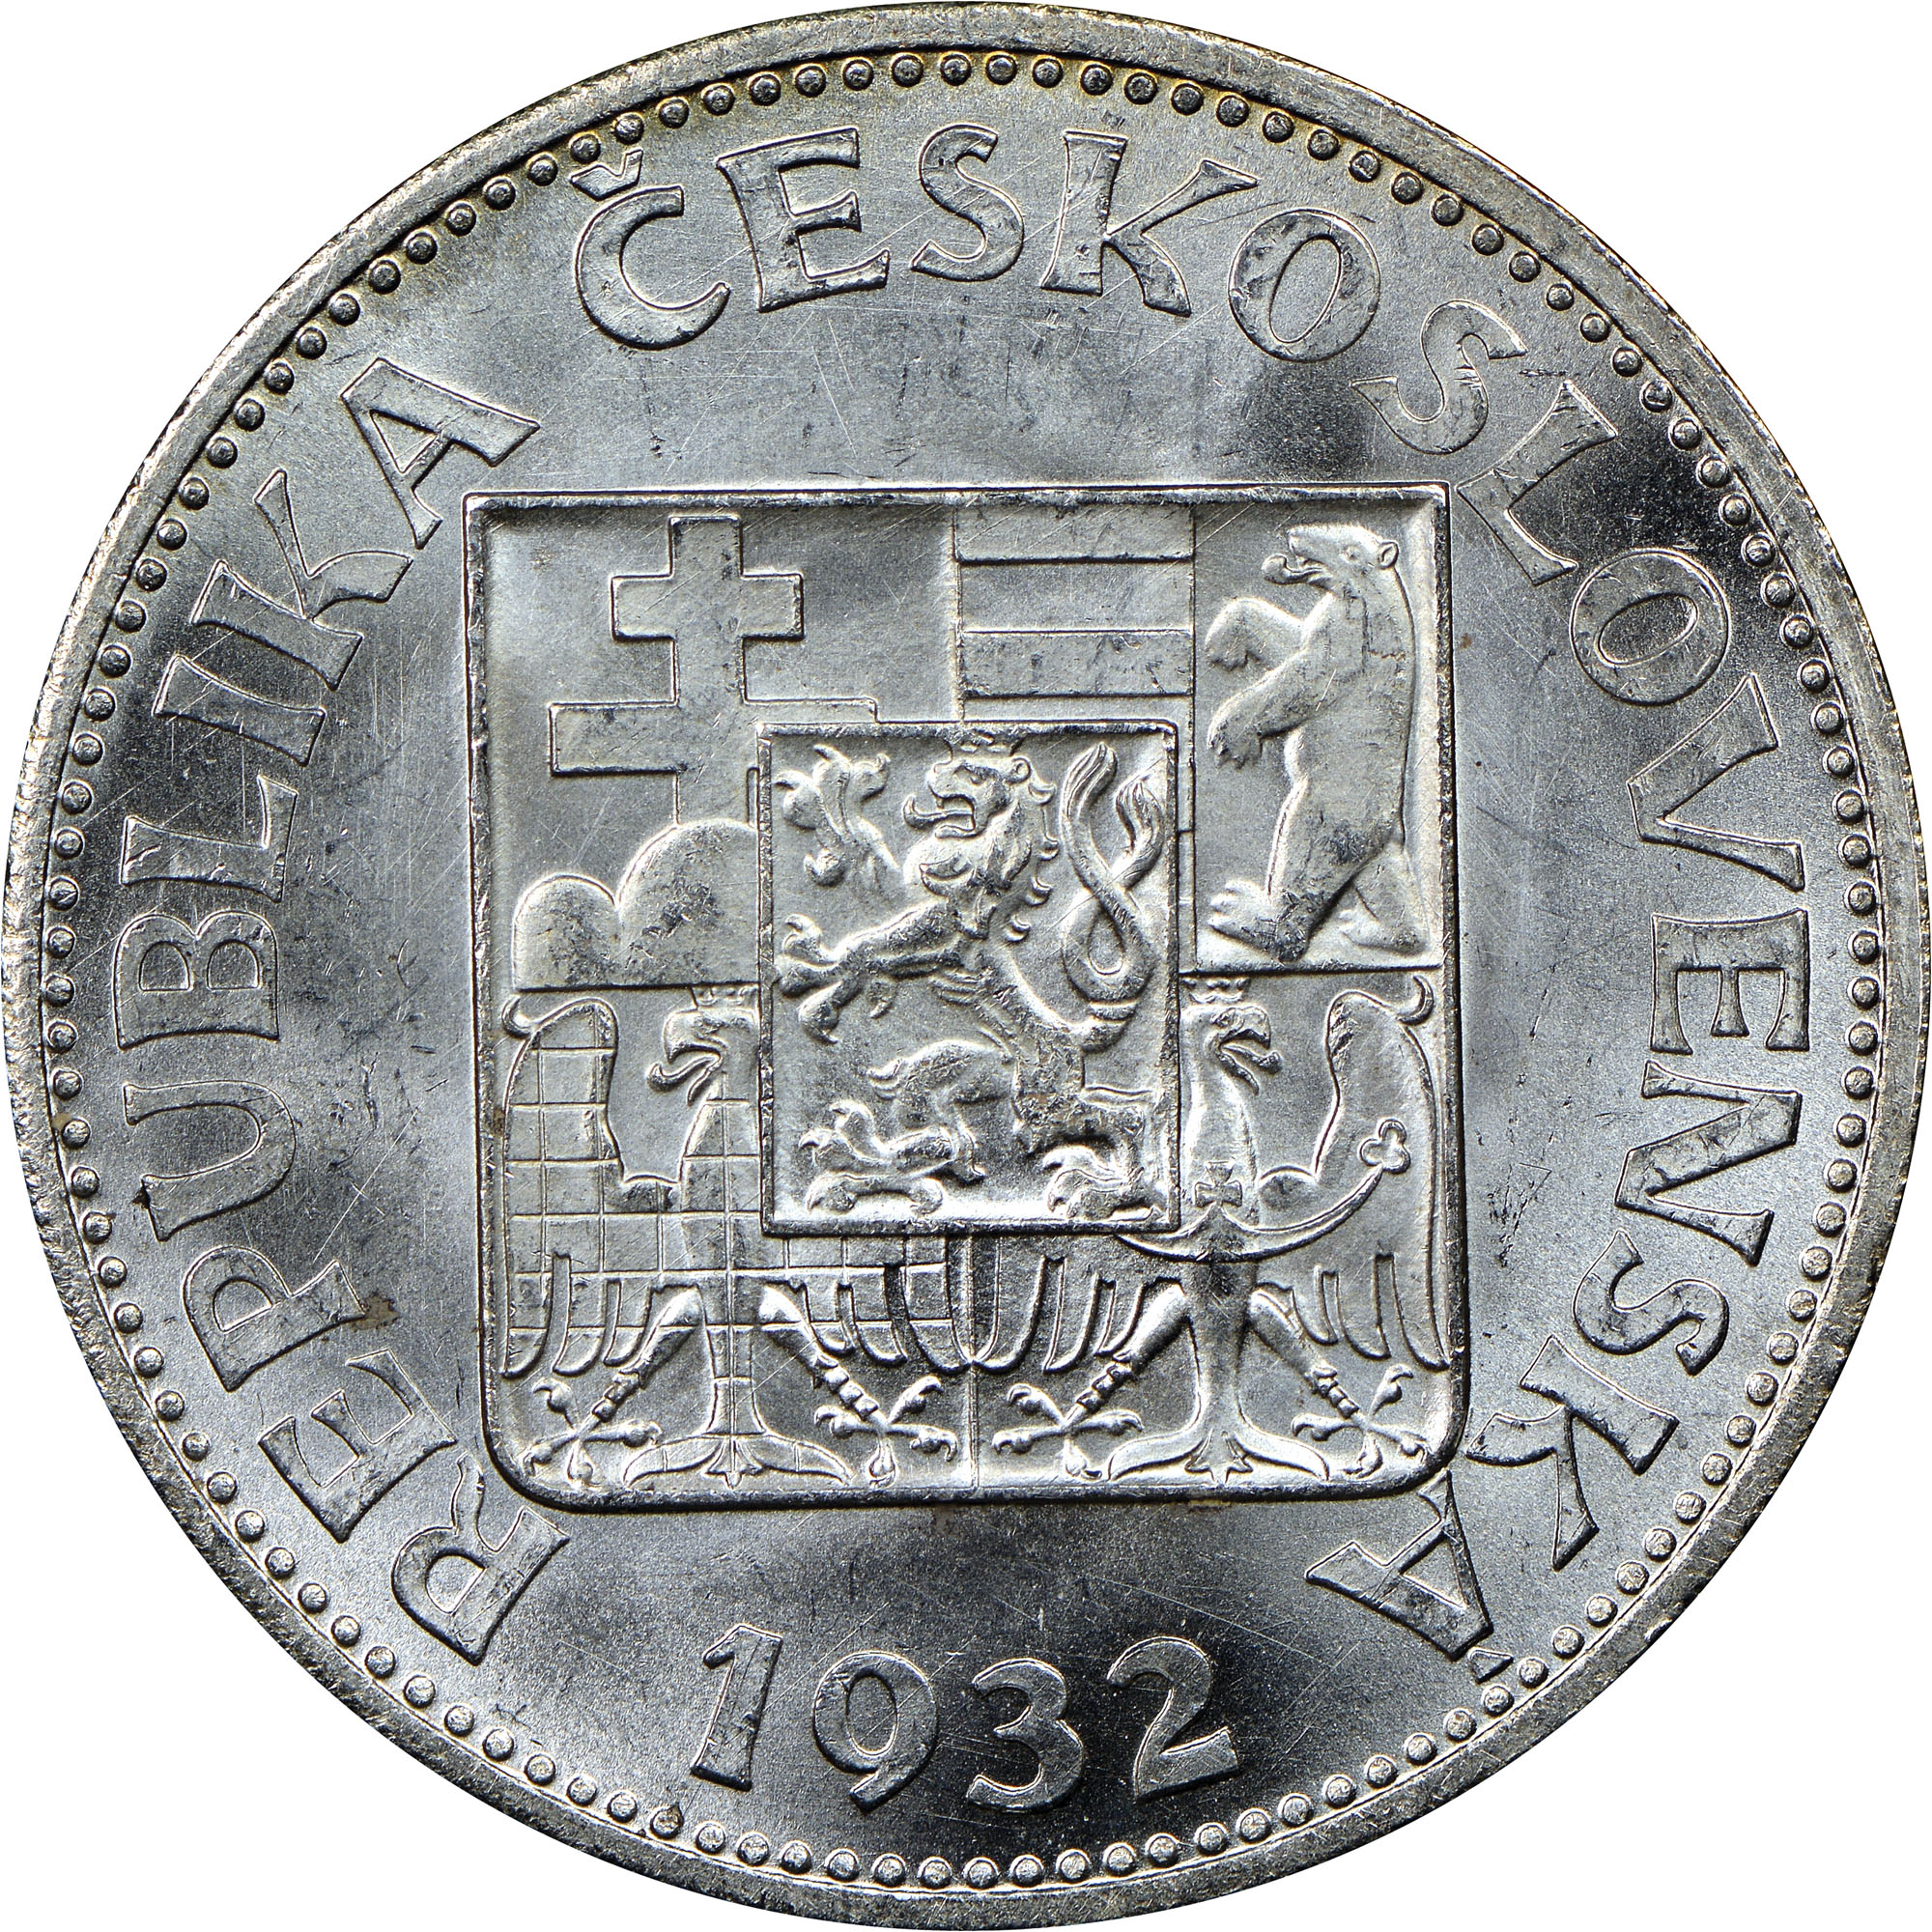 1930-1933 Czechoslovakia 10 Korun obverse